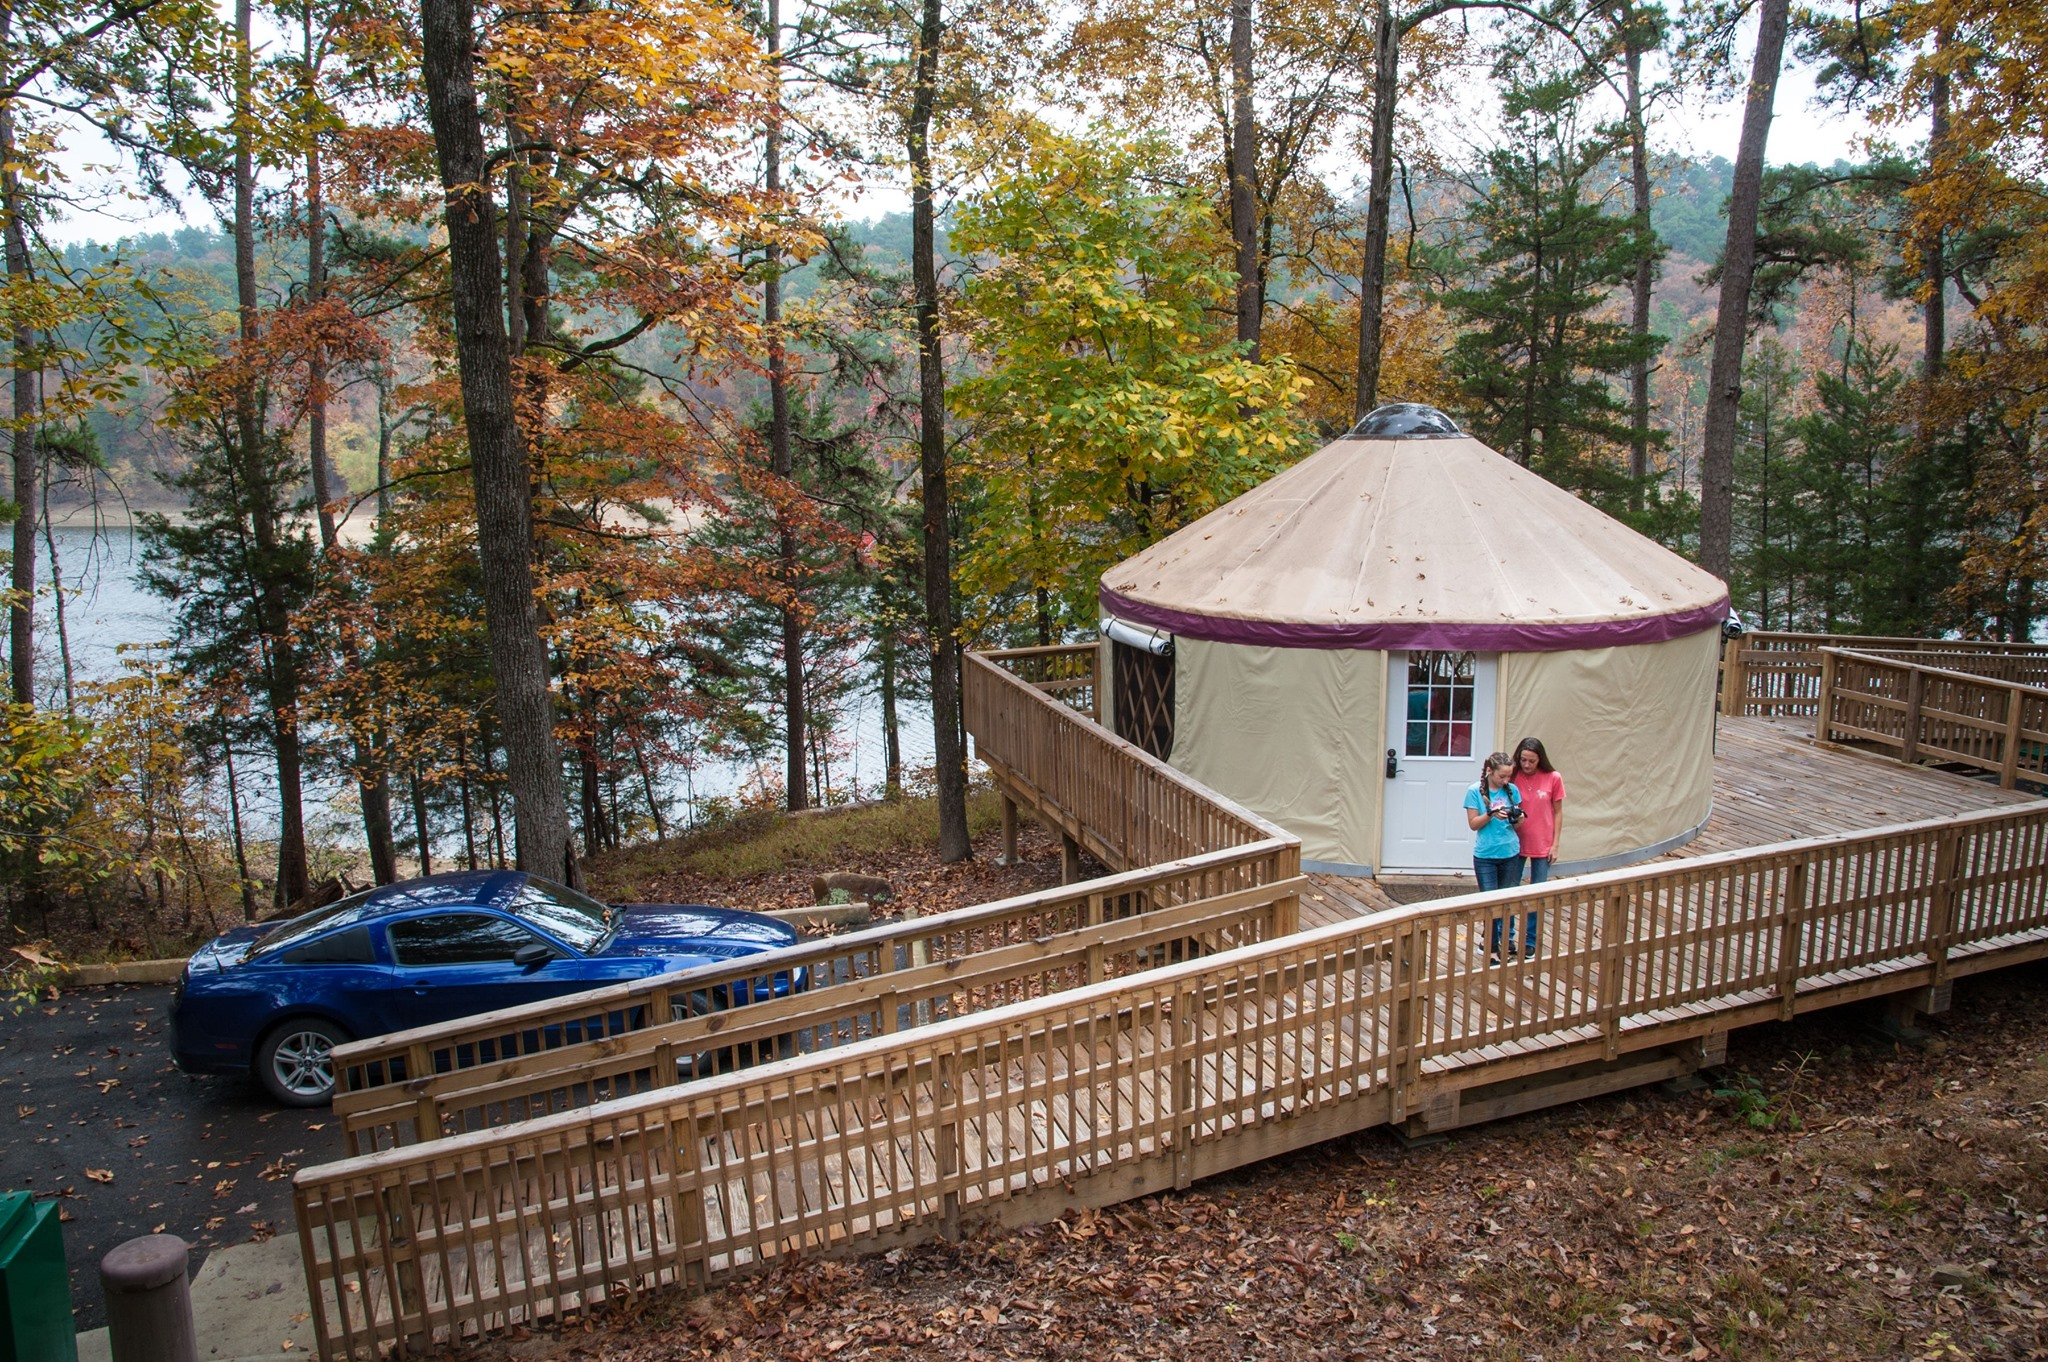 Yurt Camping In Arkansas Süper fiyatlarla yurt dışından ürünler. yurt camping in arkansas